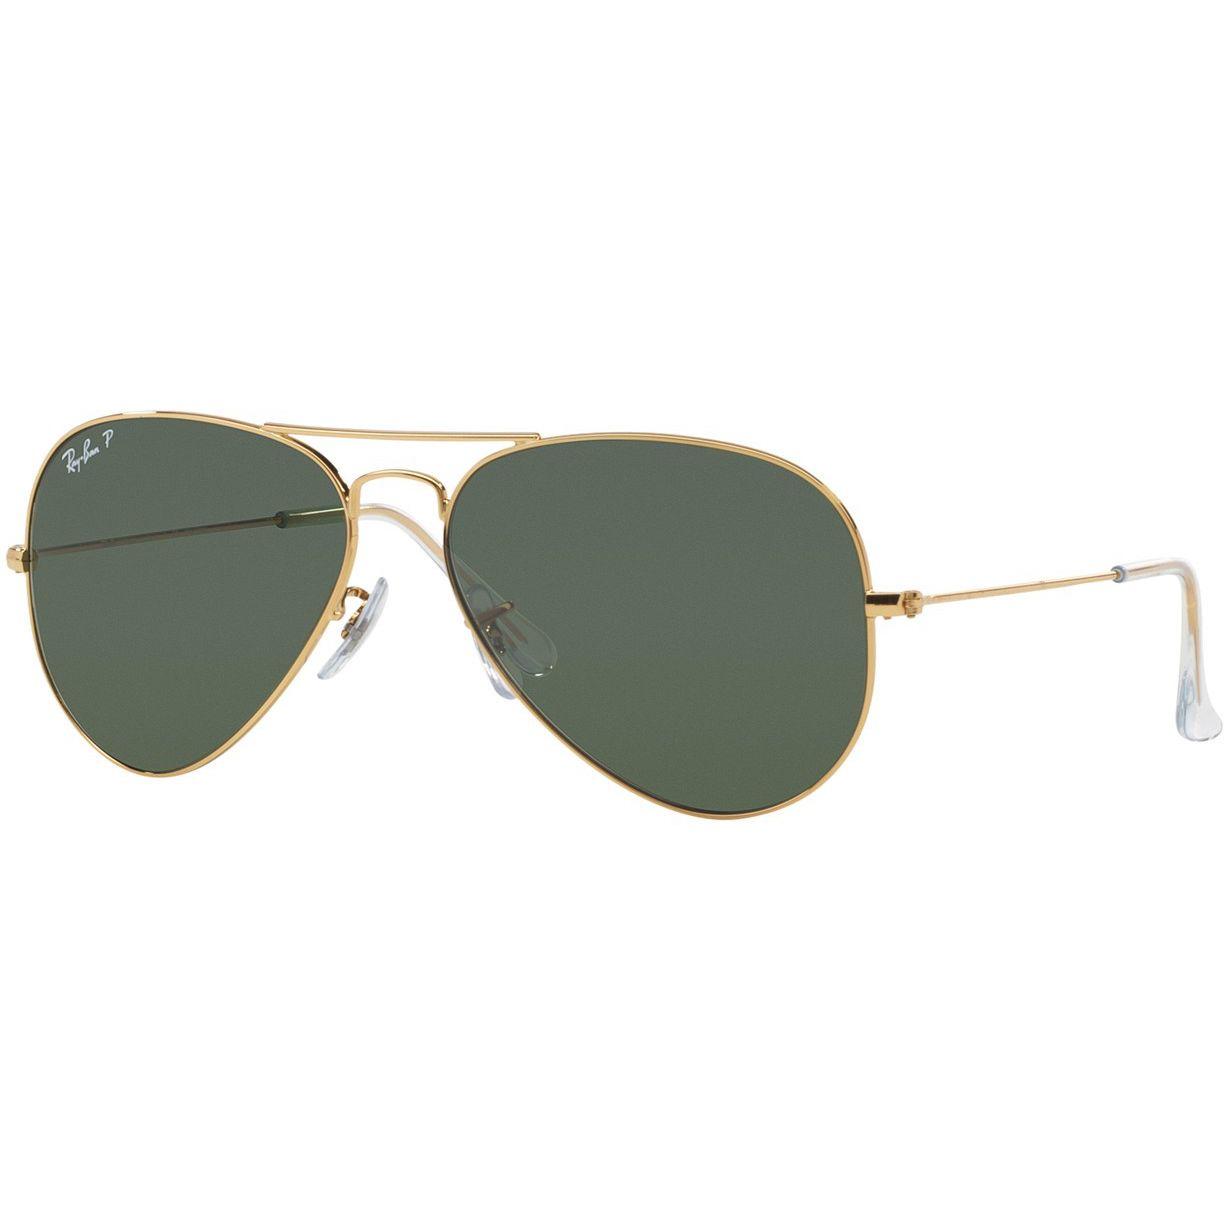 Ray-Ban Polarized Sunglasses , RB3025 AVIATOR